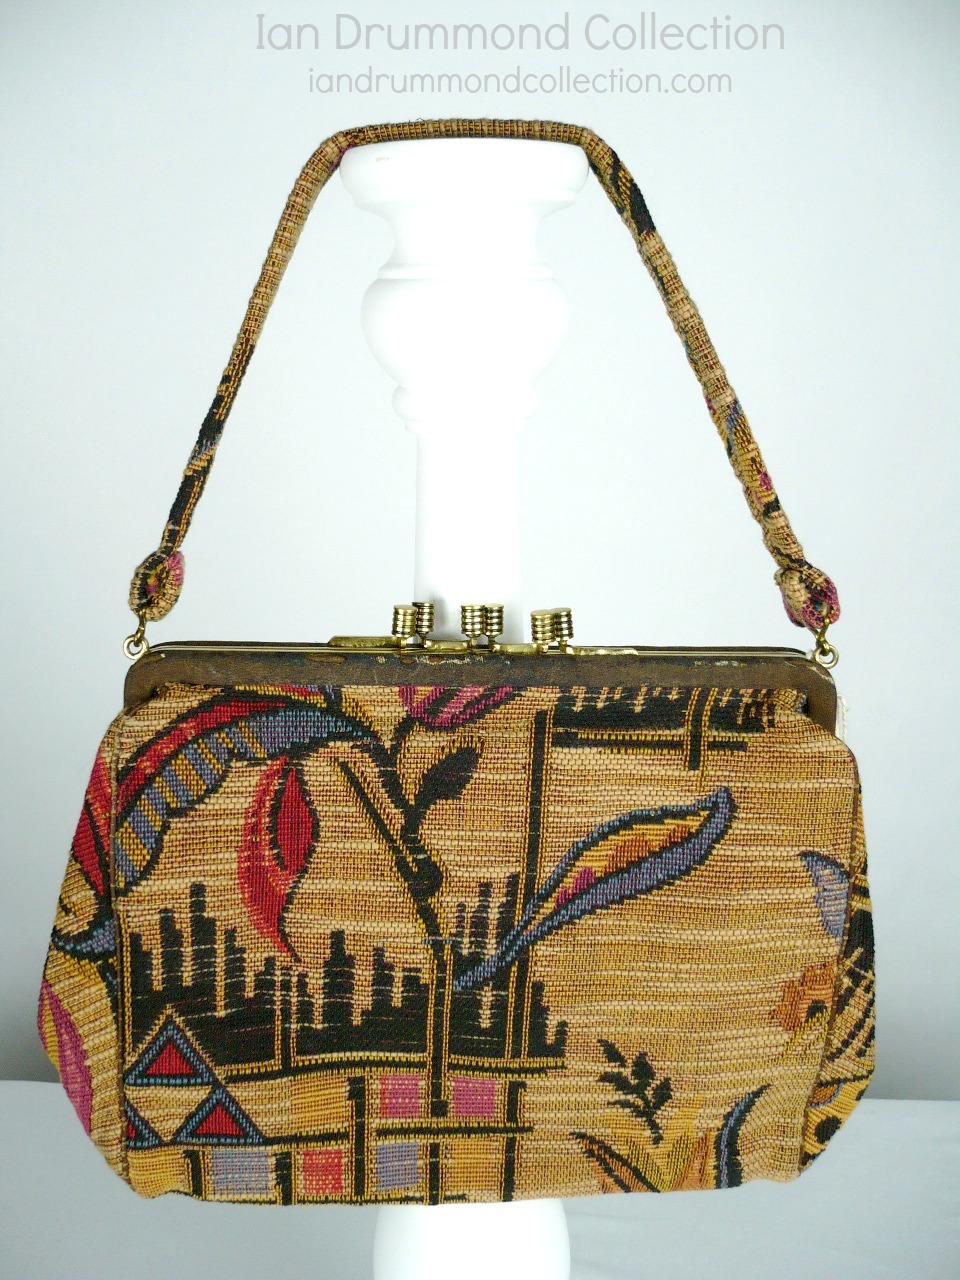 Ian Drummond Collection TV Movie Vintage Clothing Wardrobe Rental Toronto 1920s purse 15 (1)